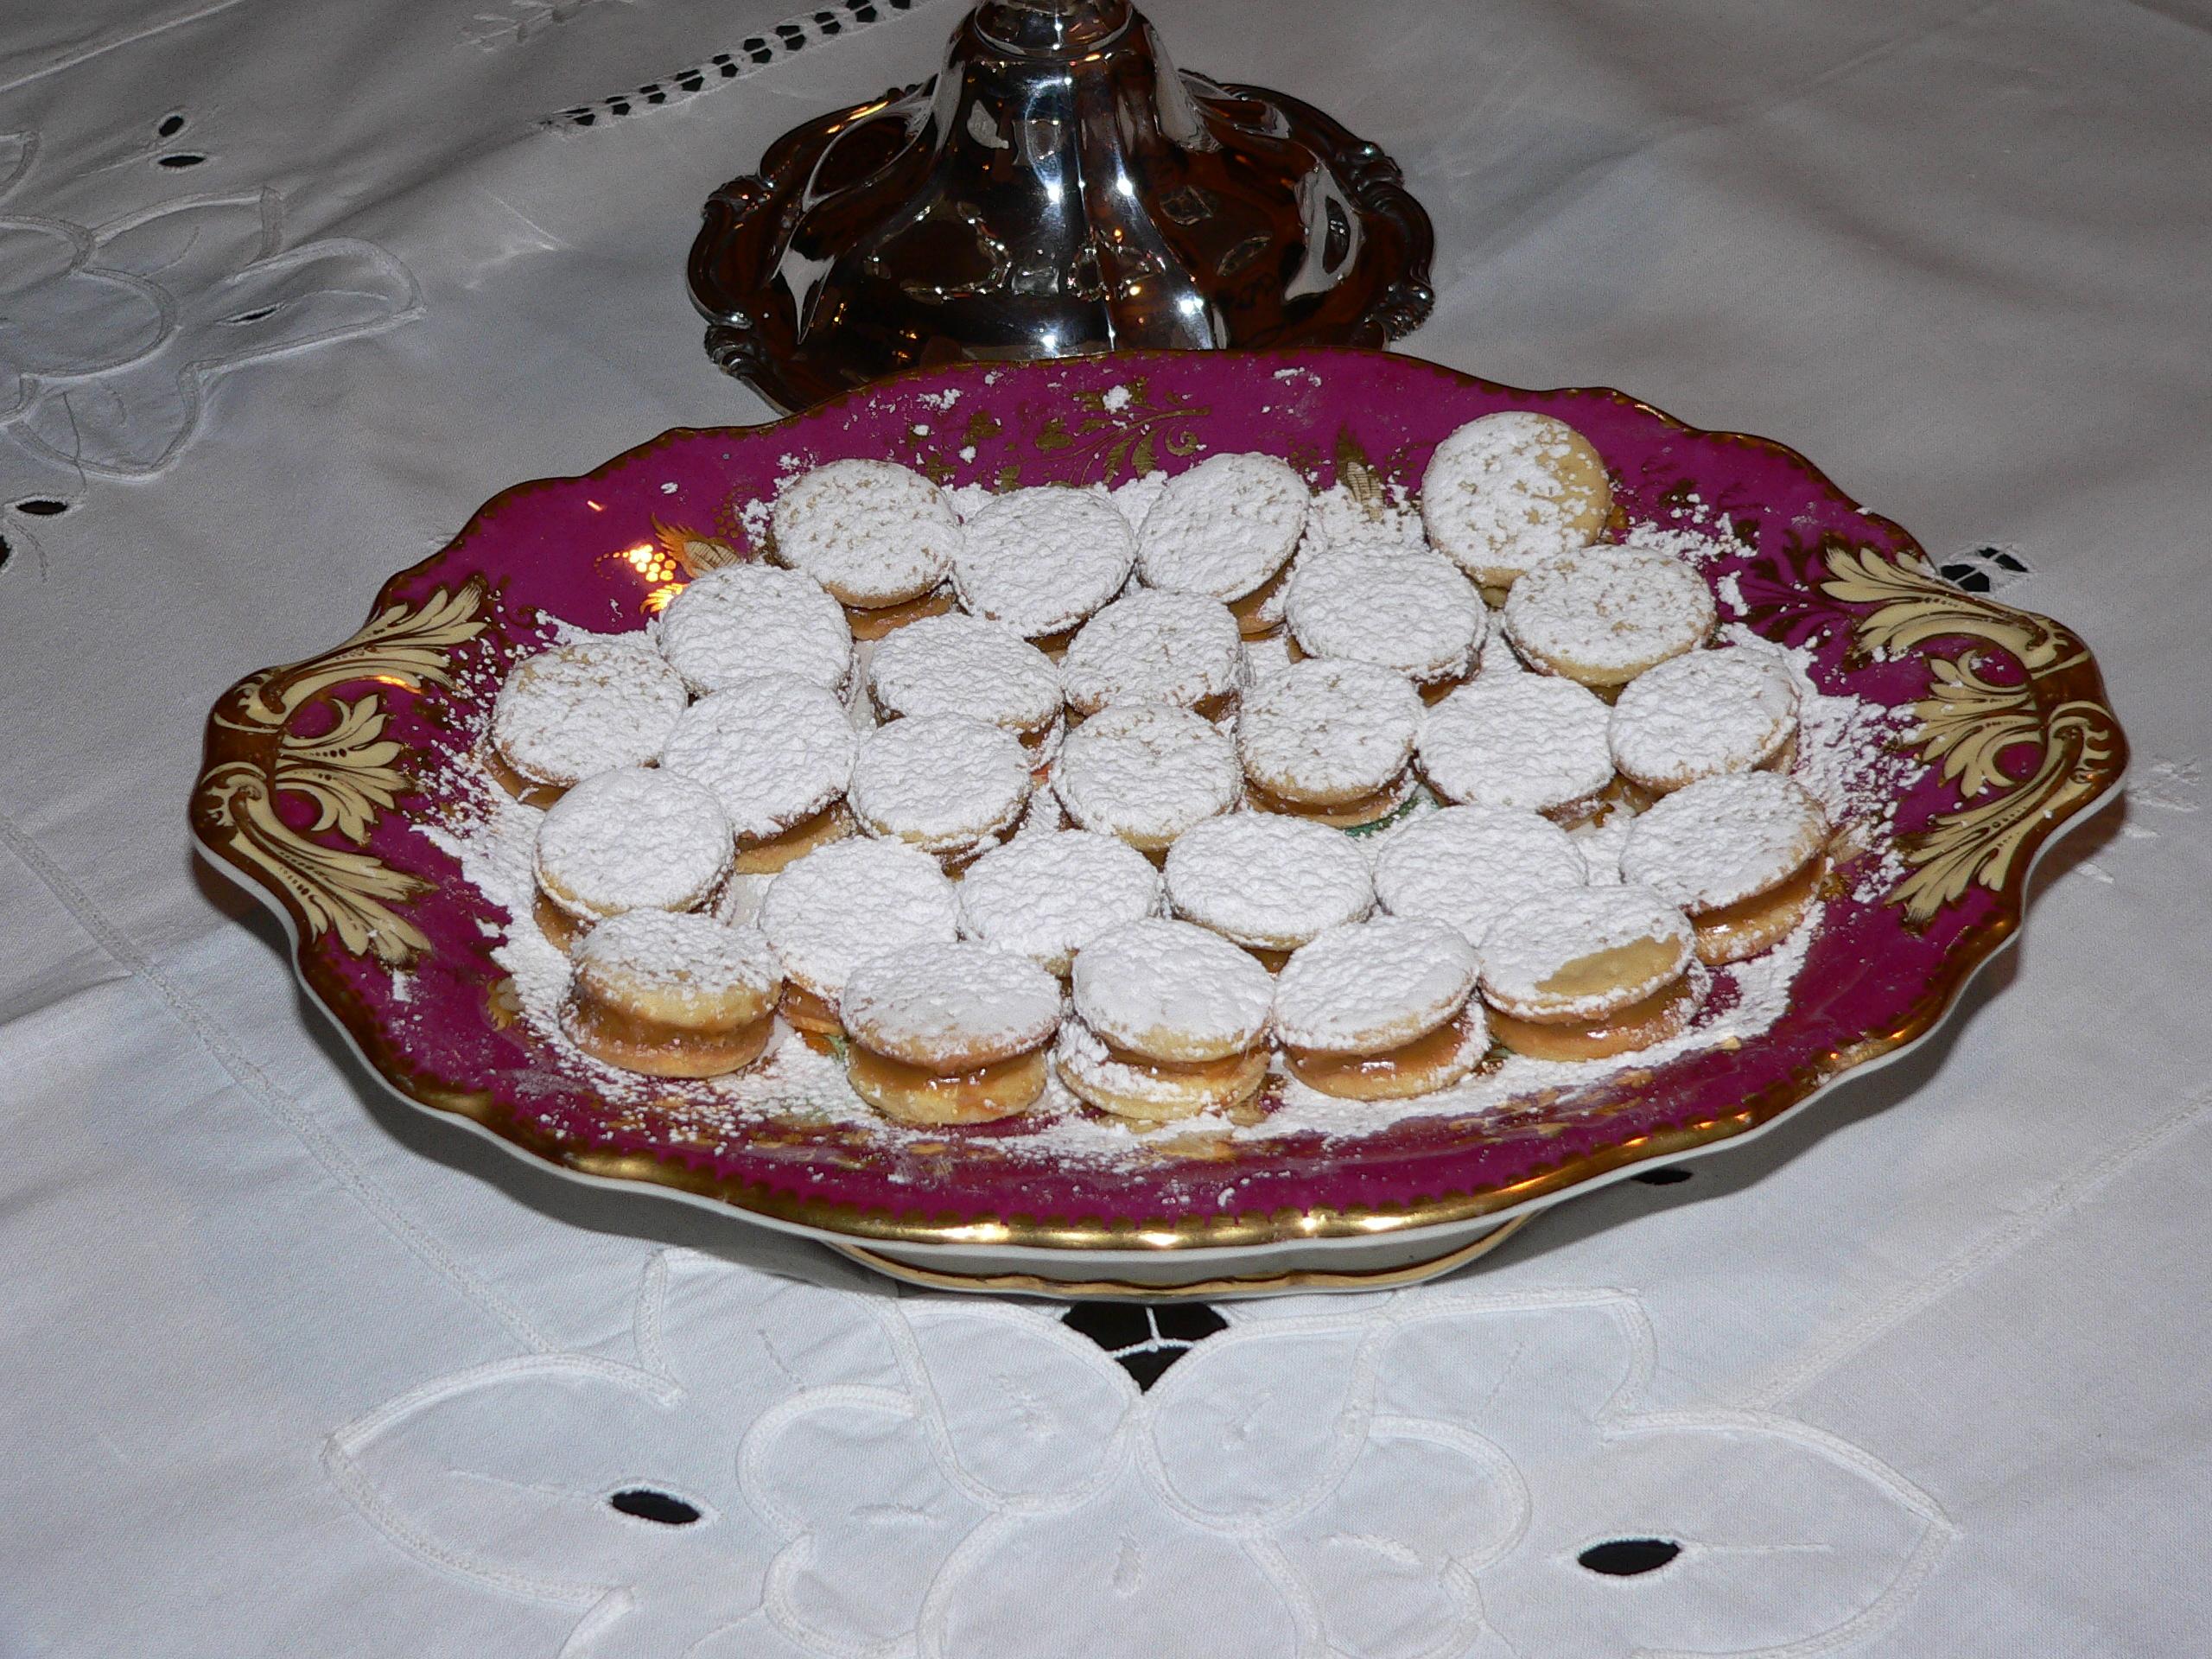 File:Alfajores.JPG - Wikipedia